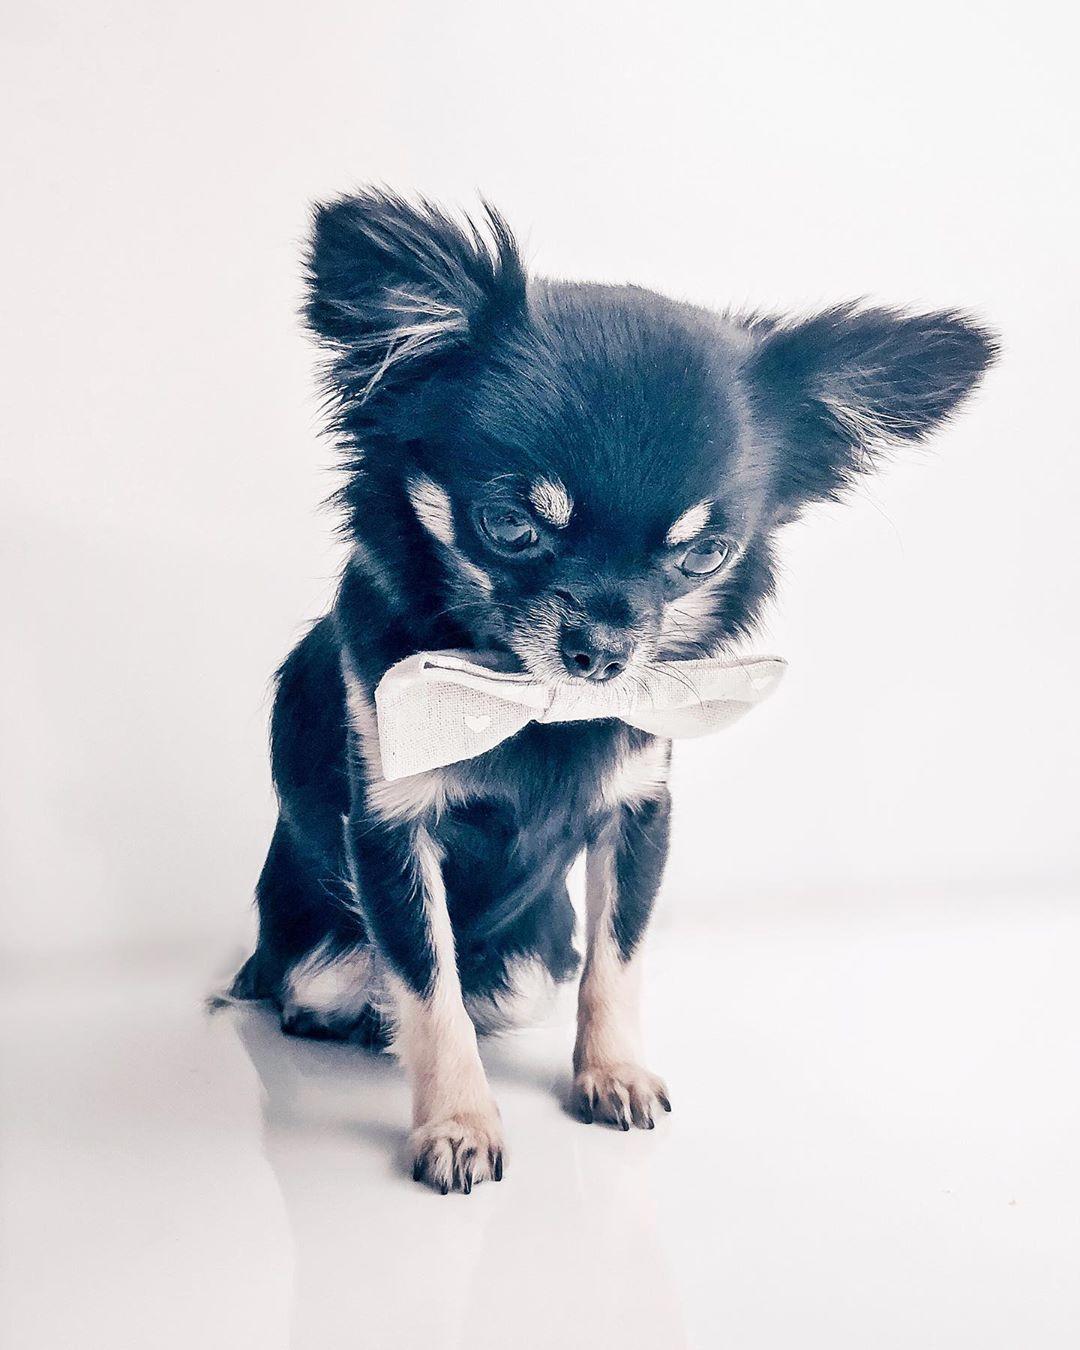 Chihuahua Kai Chihuahua Kai Cute Chihuahua Black Dog Day Chihuahua Puppies